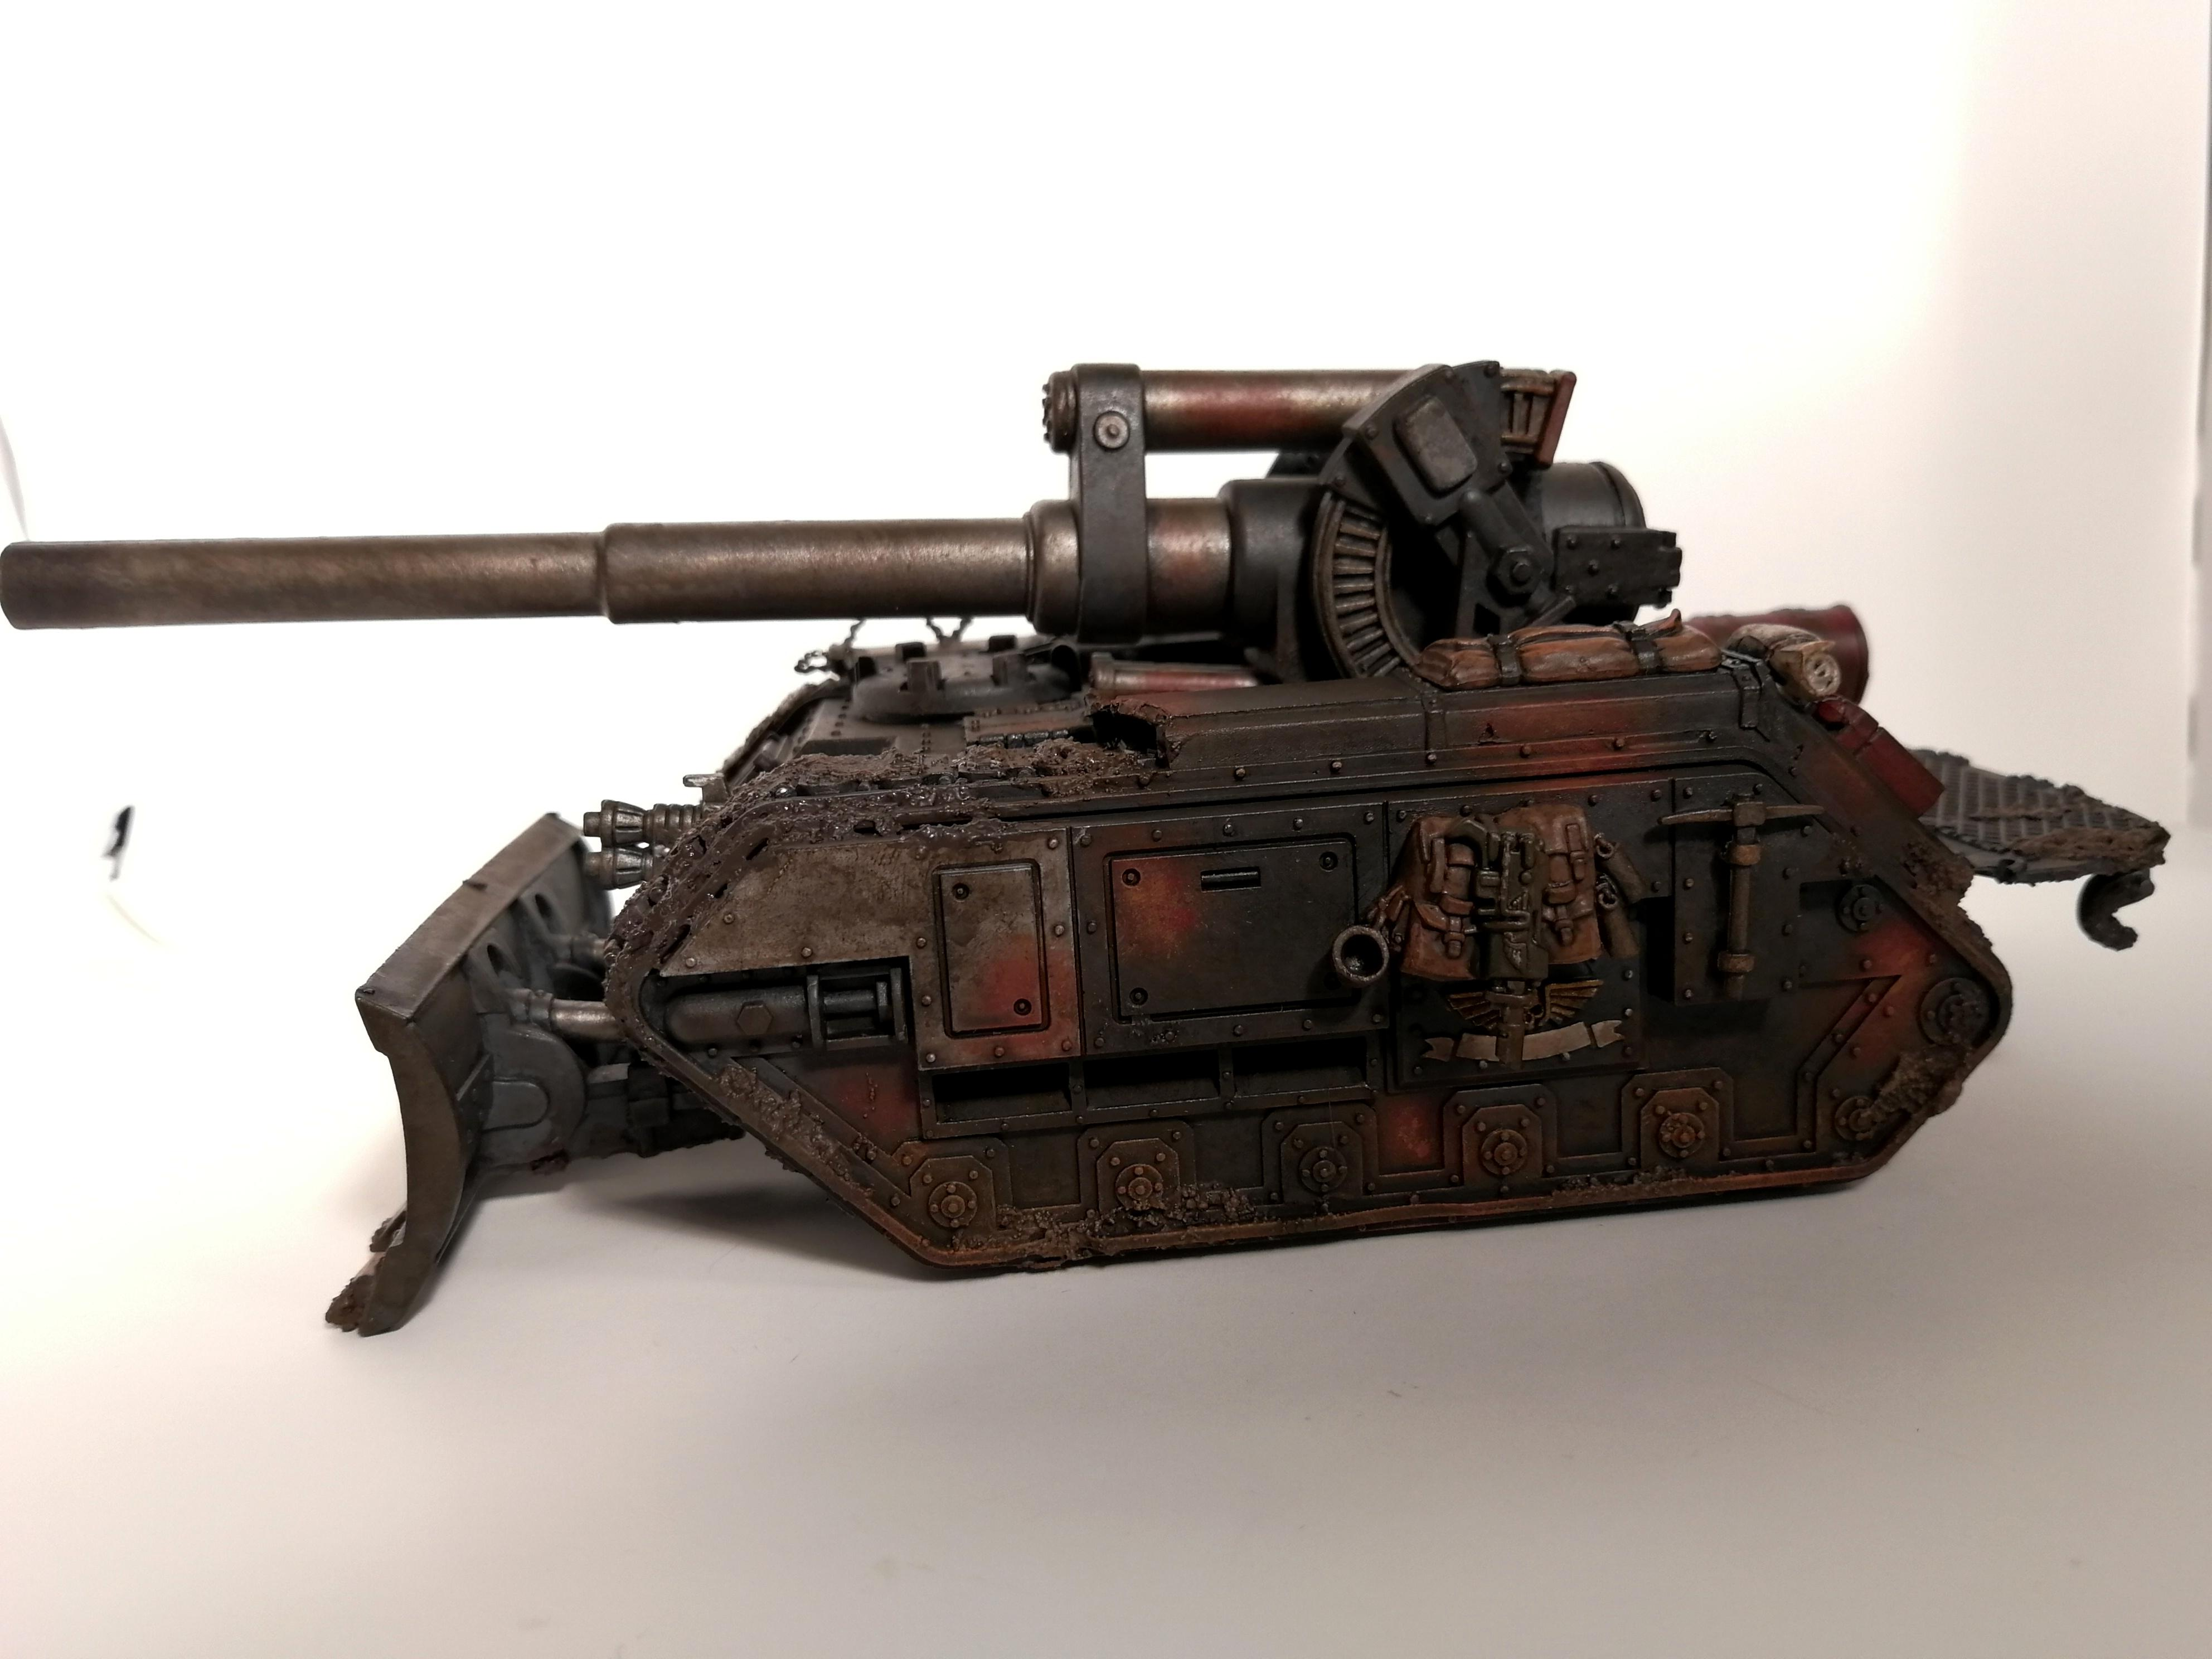 Astra Militarum, Basilisk, Death Korps of Krieg, Rust, Tank, Warhammer 40,000